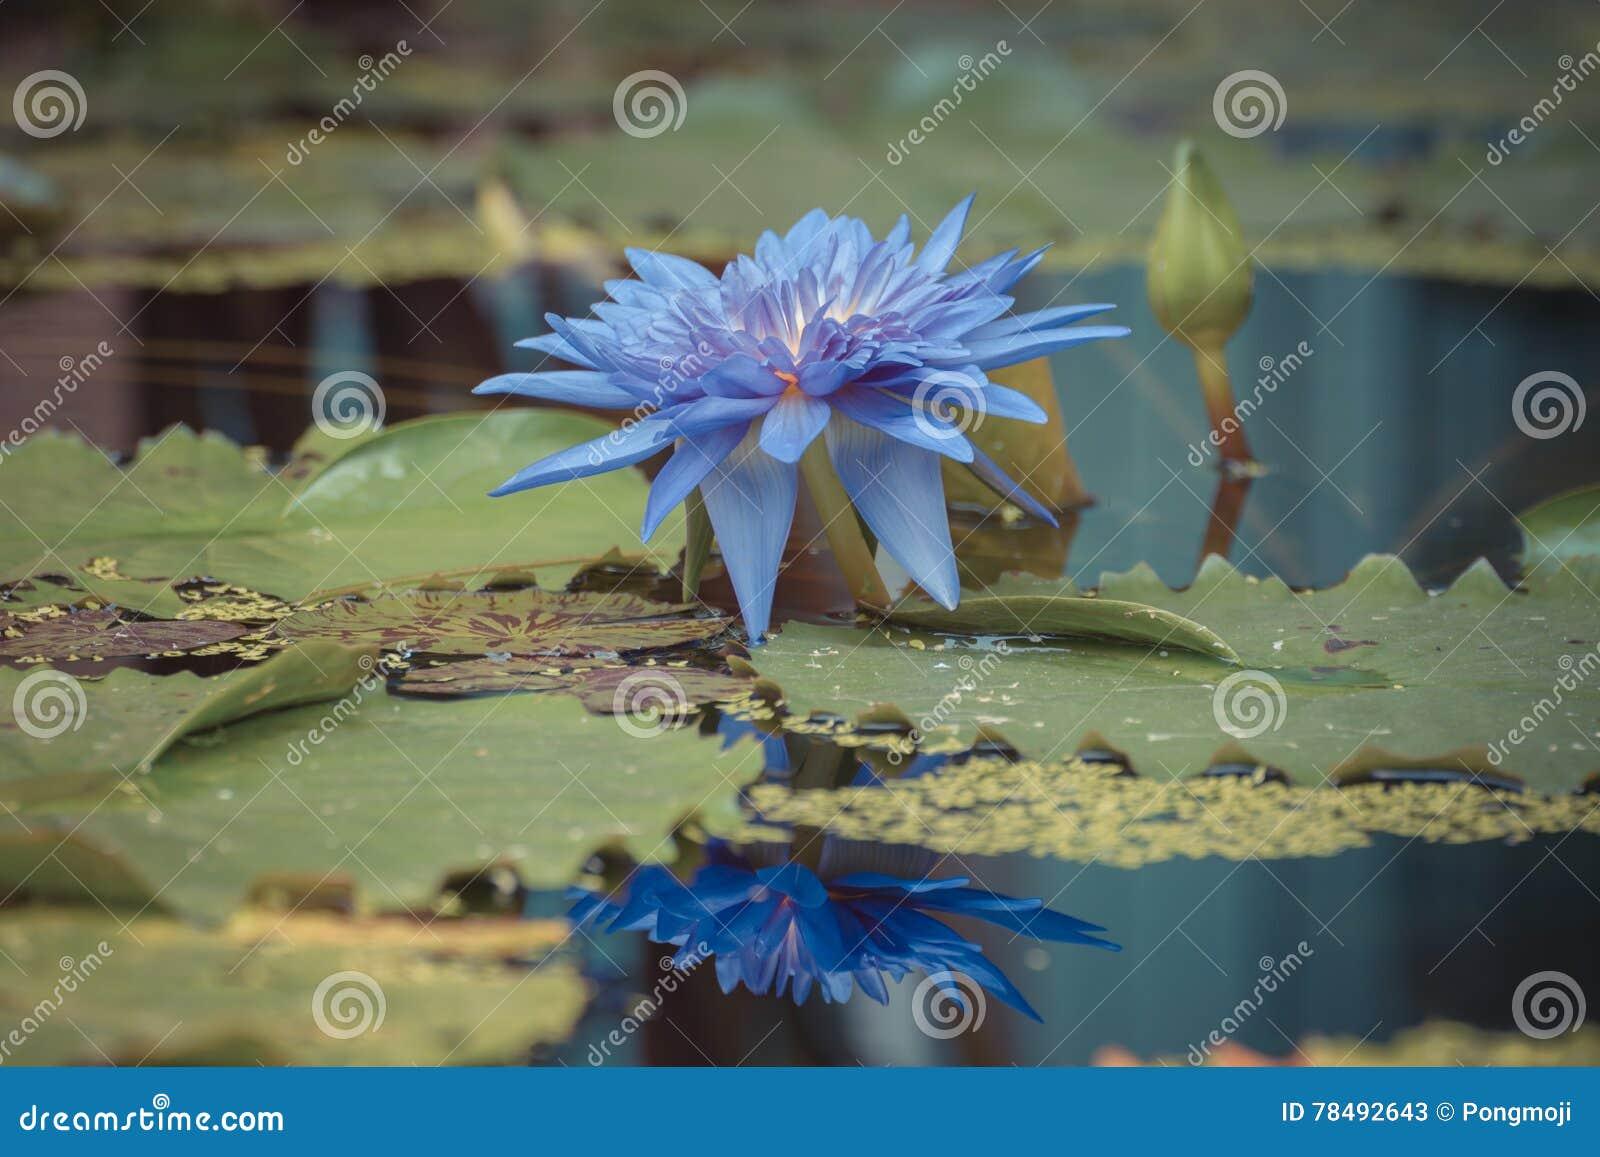 Lotus flower purple color stock image. Image of botanical - 78492643